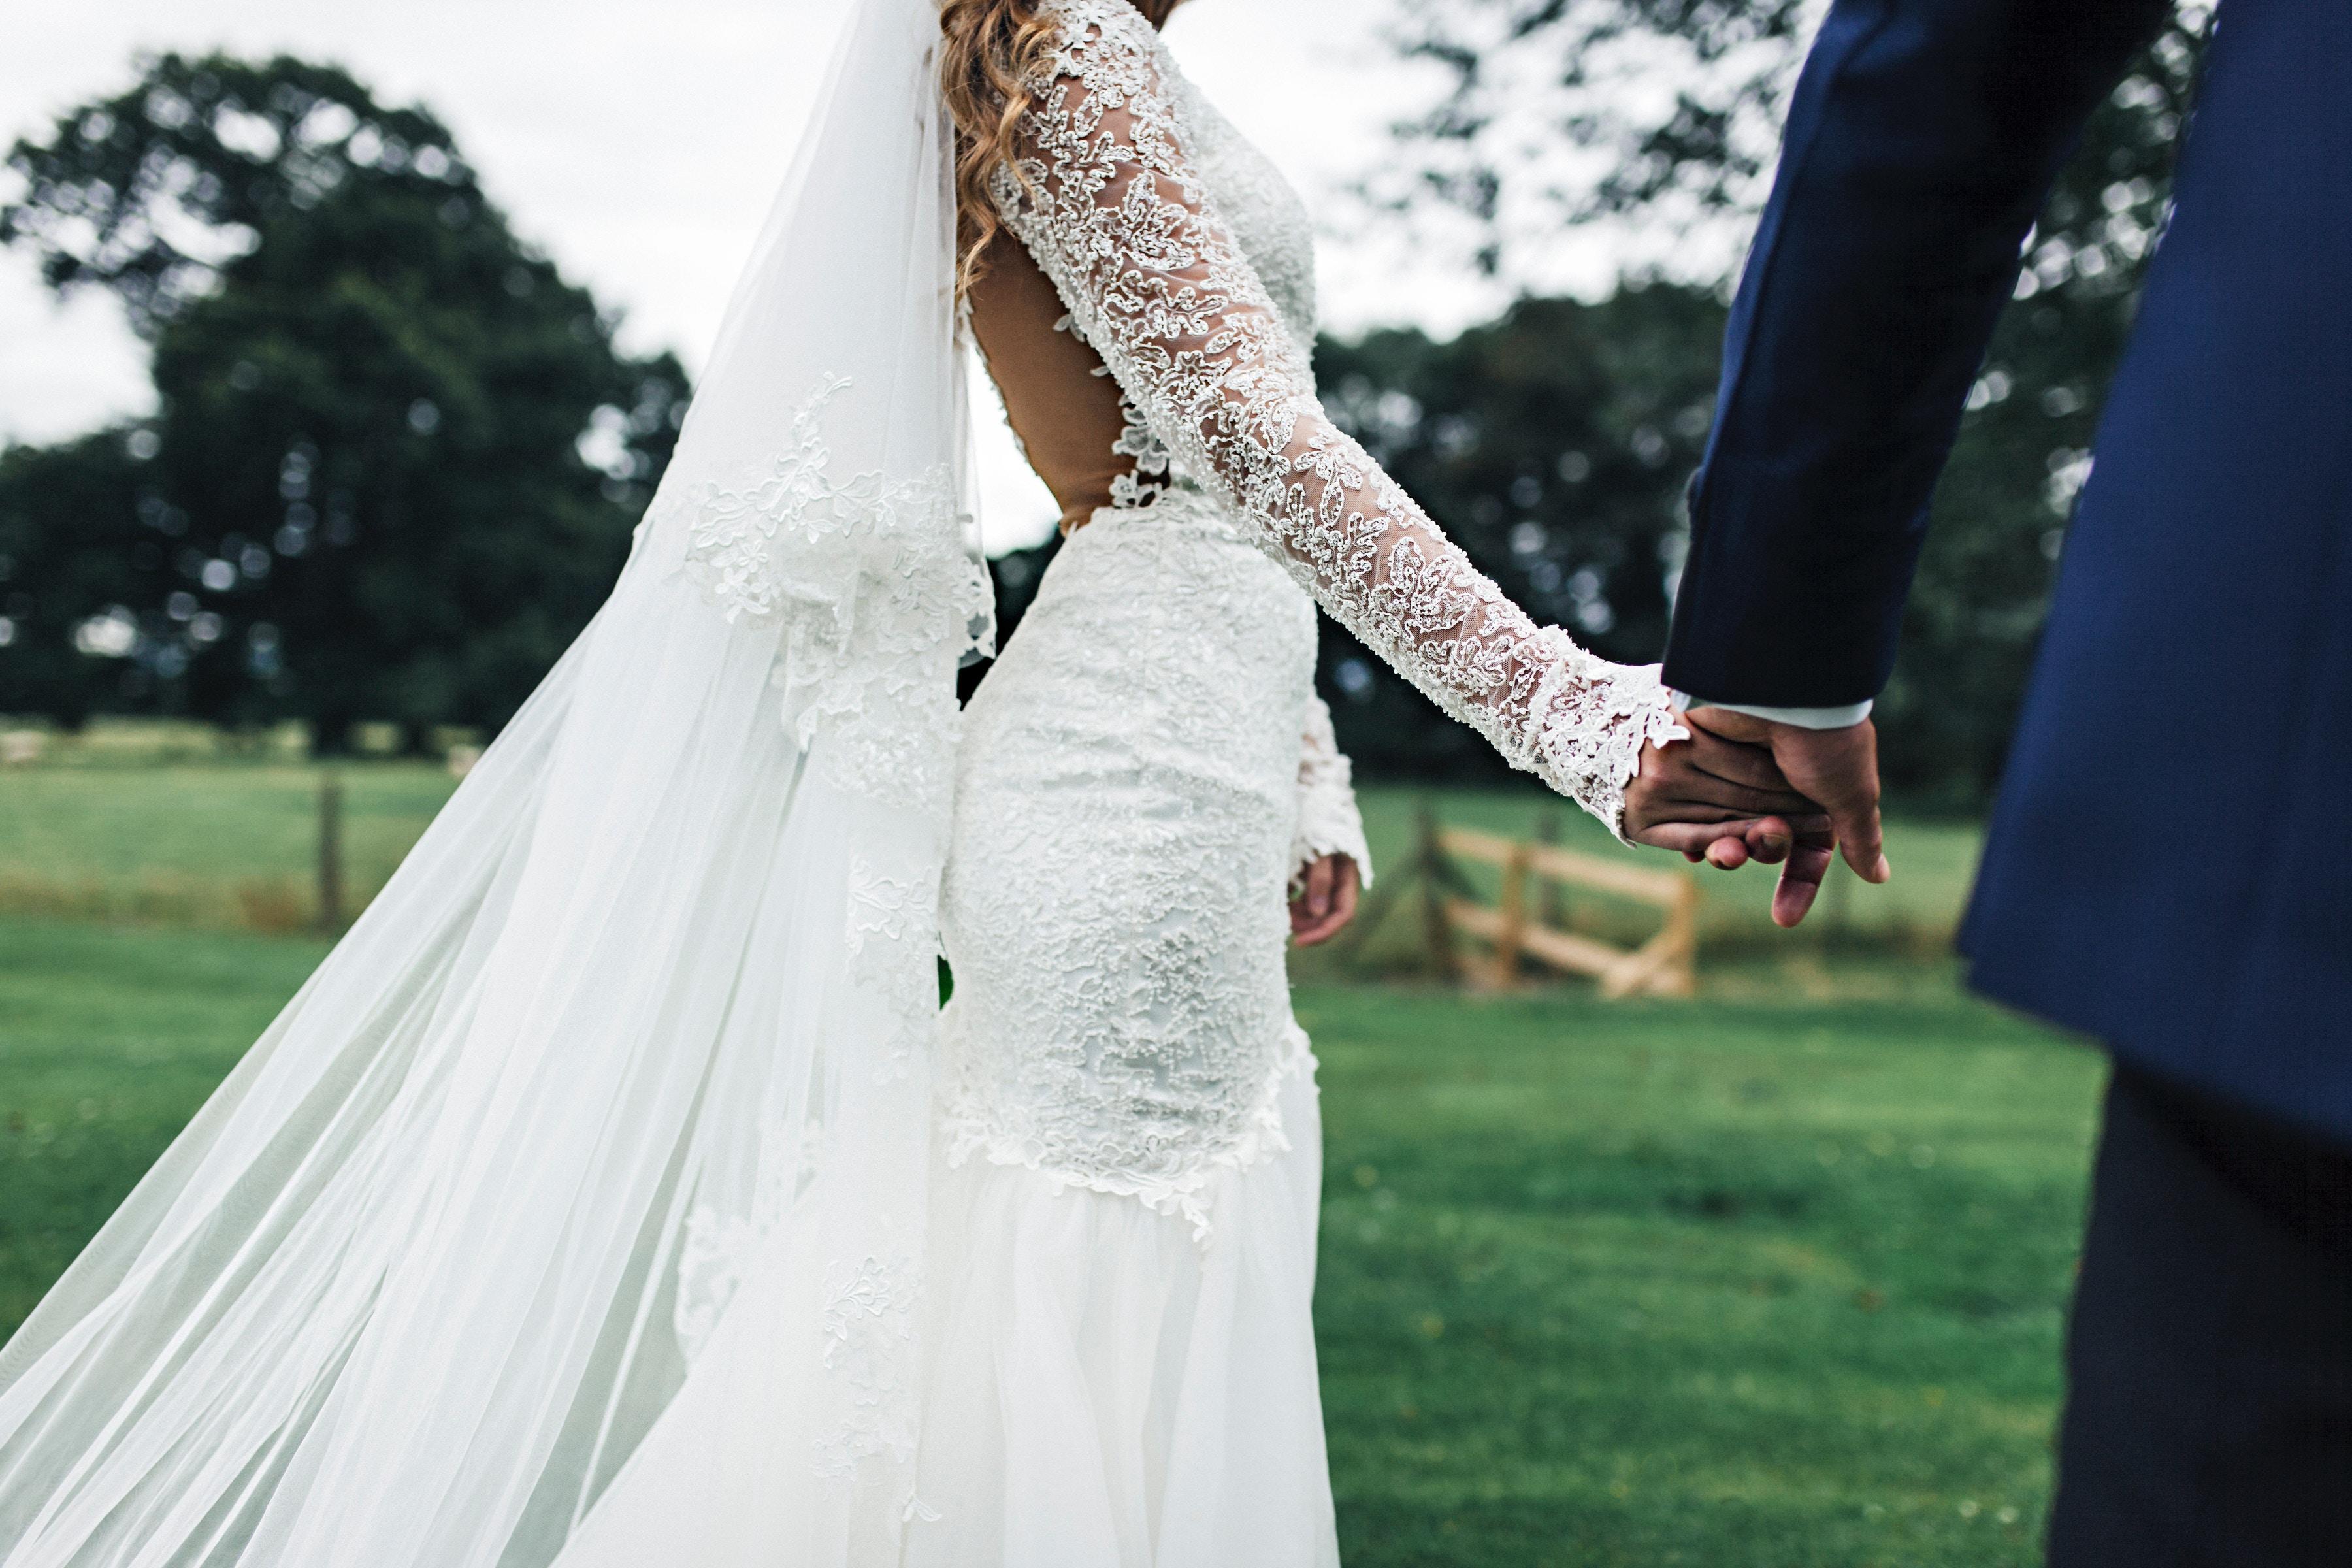 Wedding dresses don't normally have pockets. Credit: Unsplash